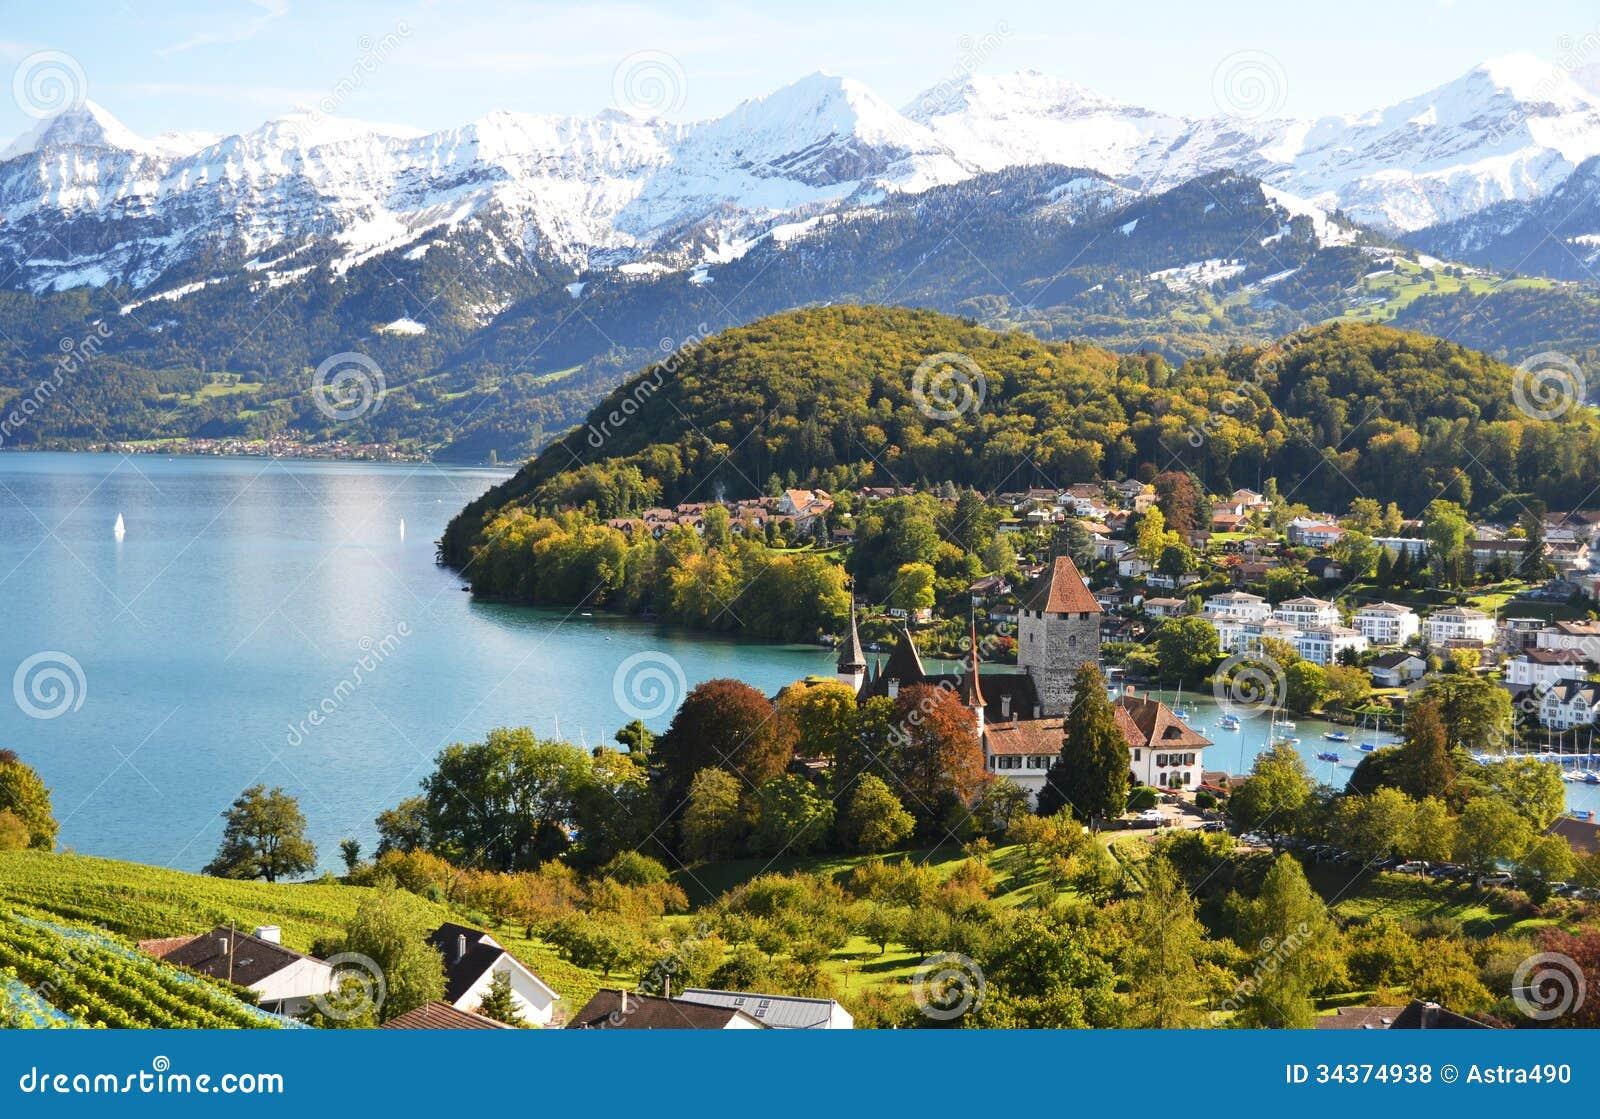 Spiez Switzerland  city photo : Spiez Castle, Switzerland Royalty Free Stock Photos Image: 34374938